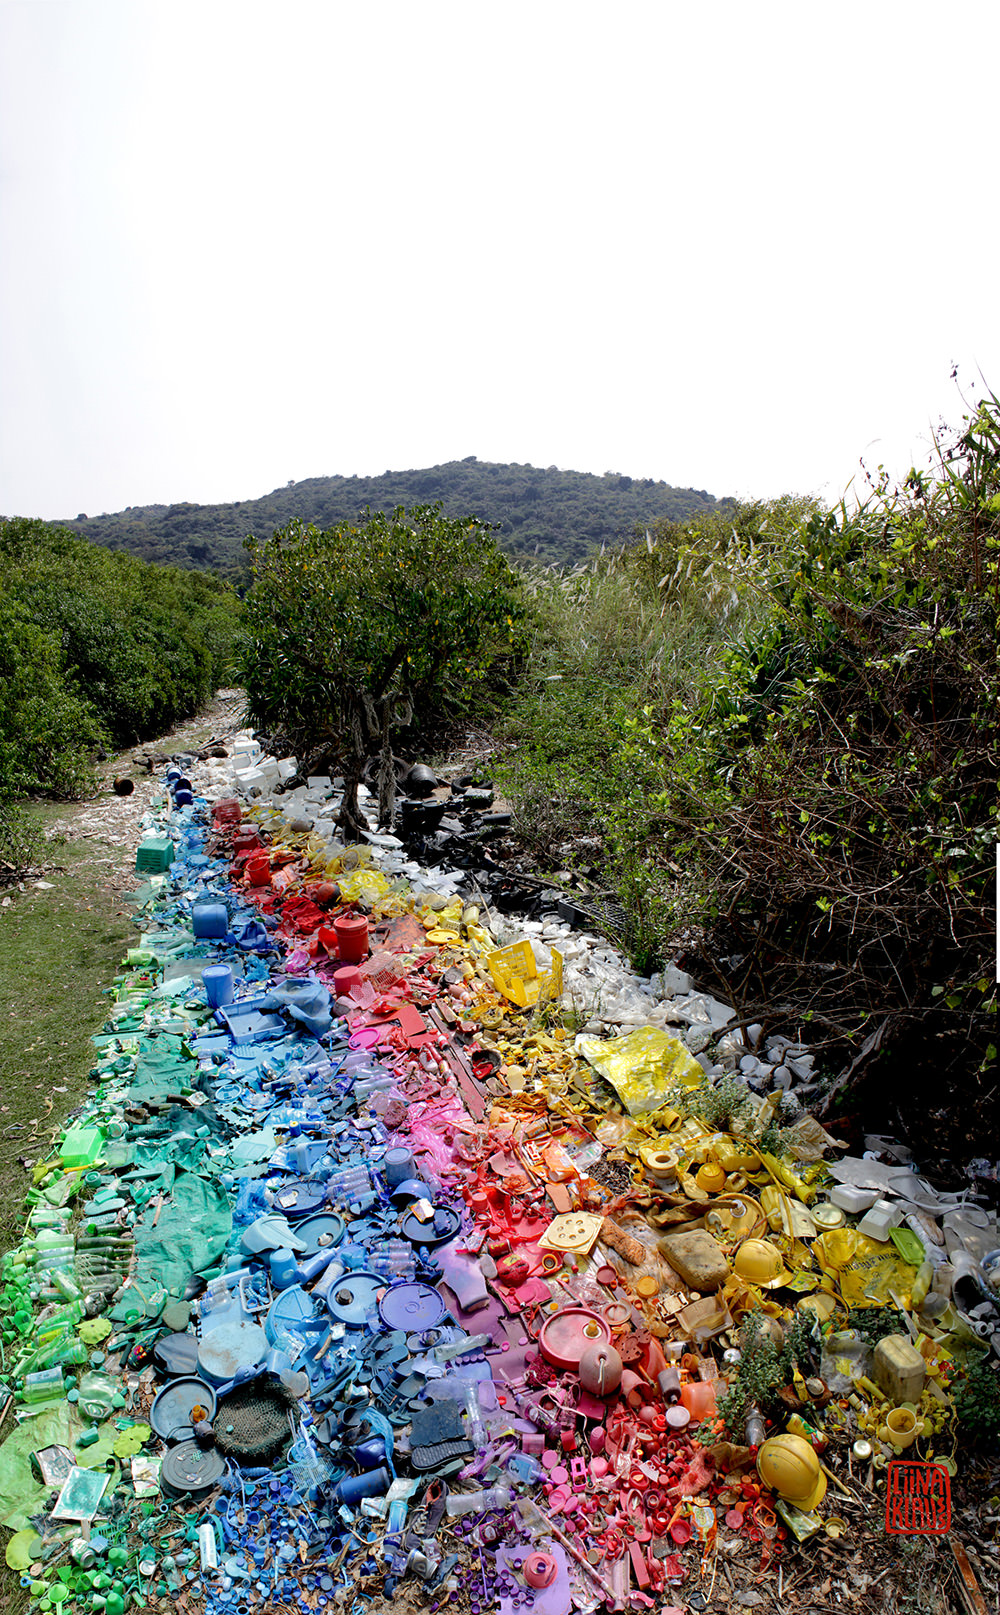 river-of-rubbish-liina-klauss_river-of-rubbish-liinaklauss2014